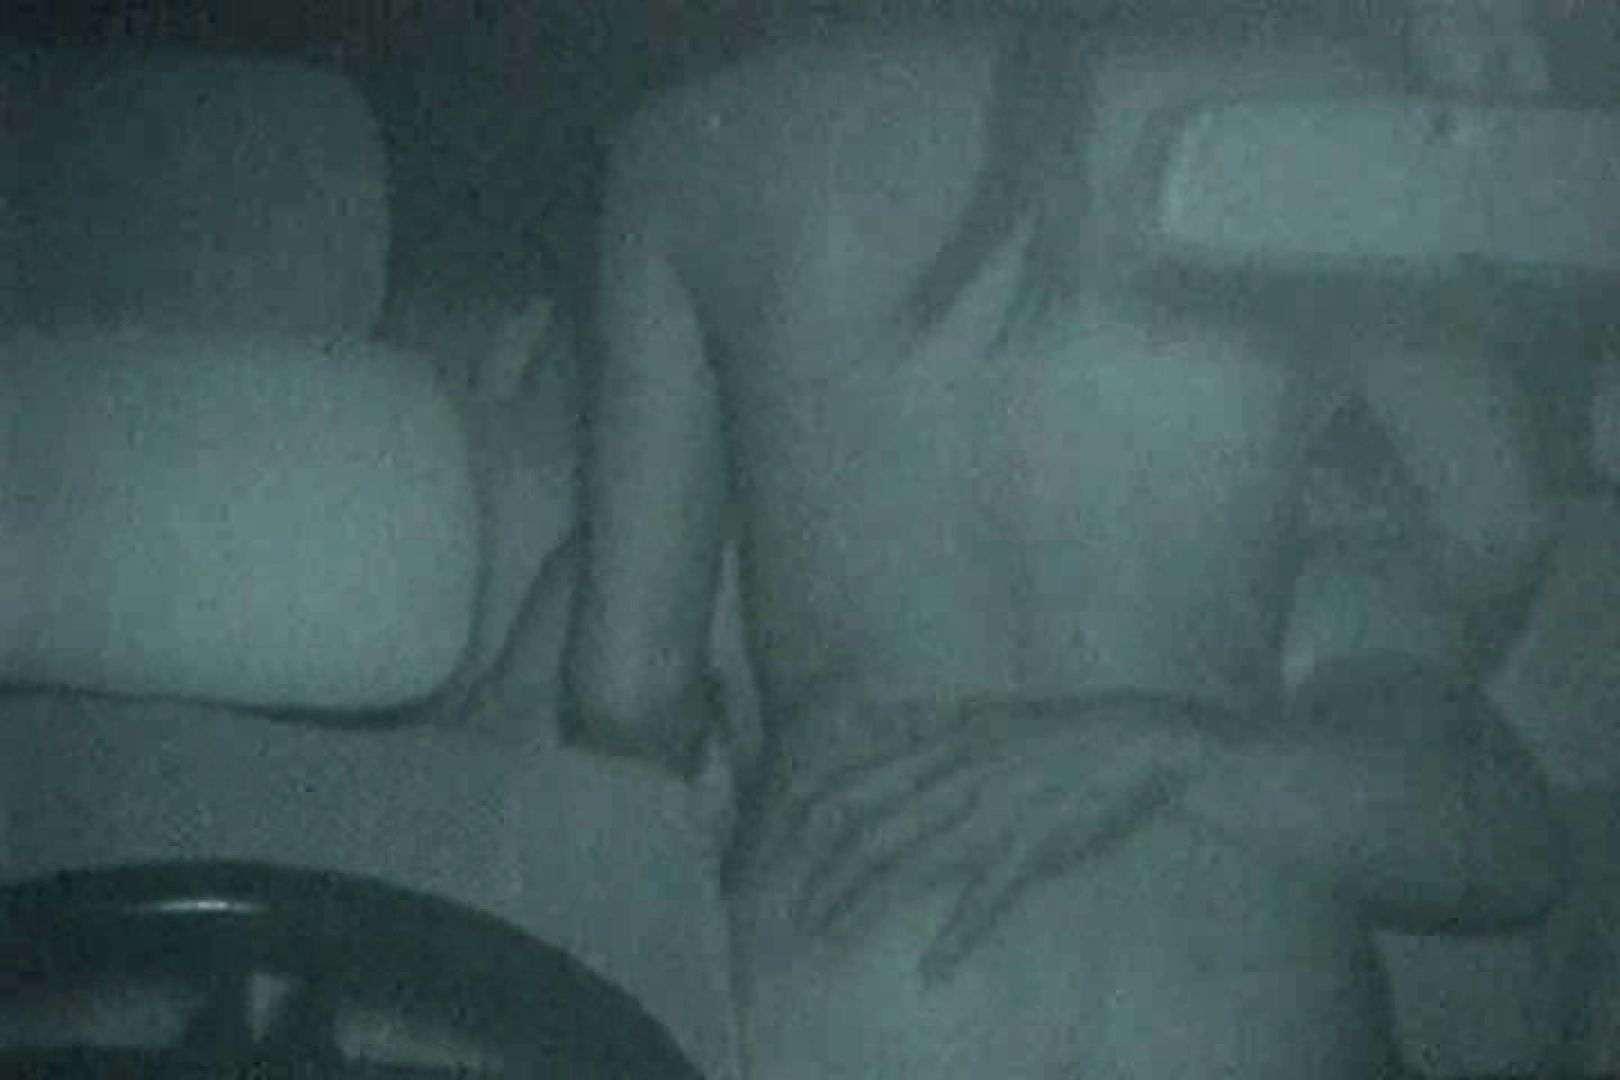 充血監督の深夜の運動会Vol.130 赤外線 セックス無修正動画無料 70PIX 23